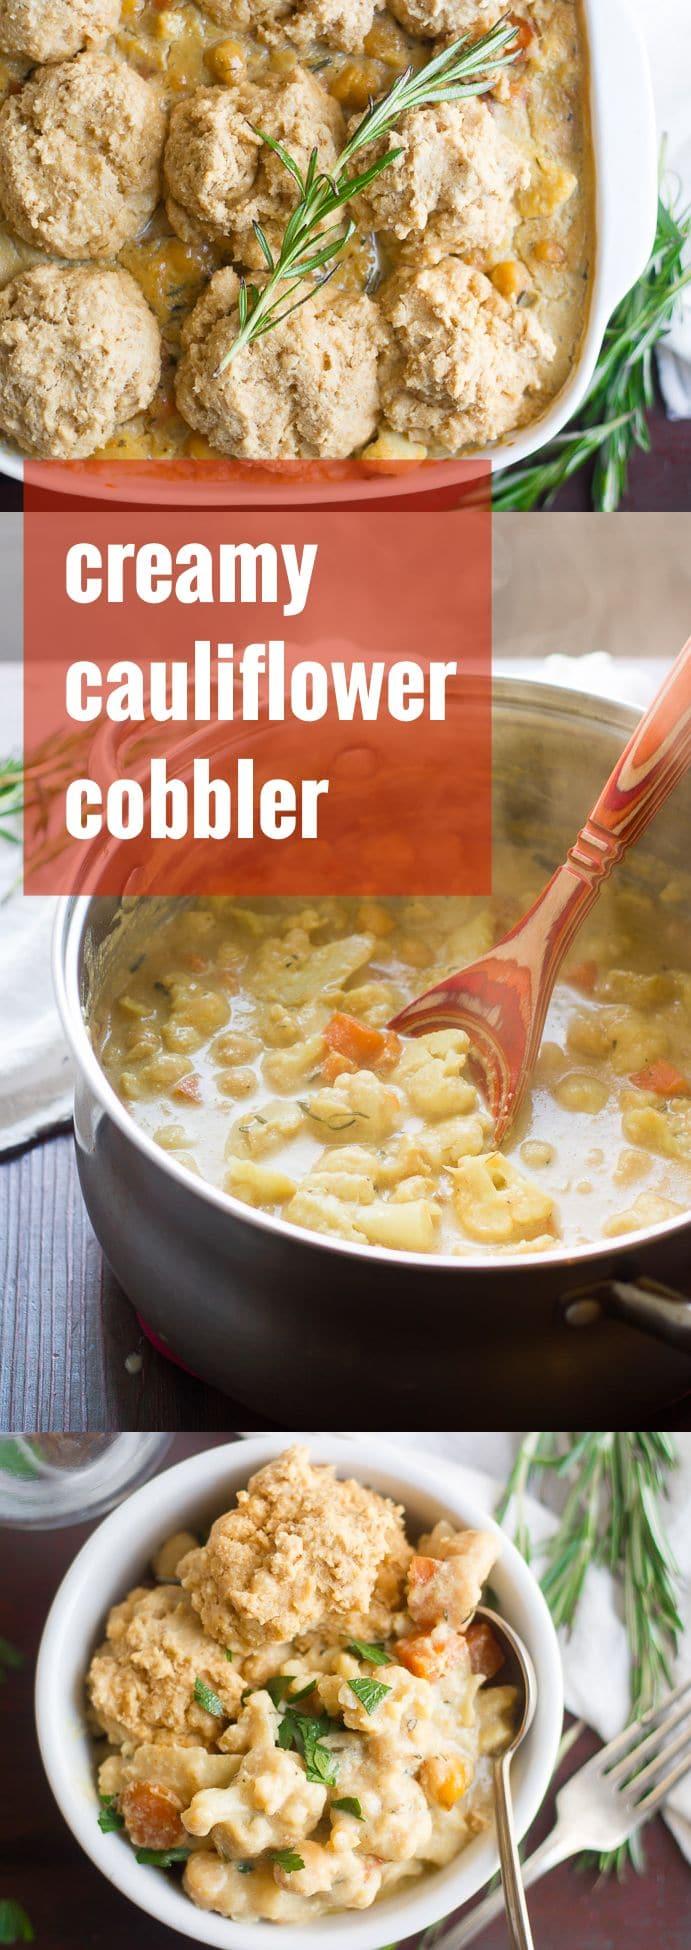 Creamy Cauliflower Savory Vegan Cobbler